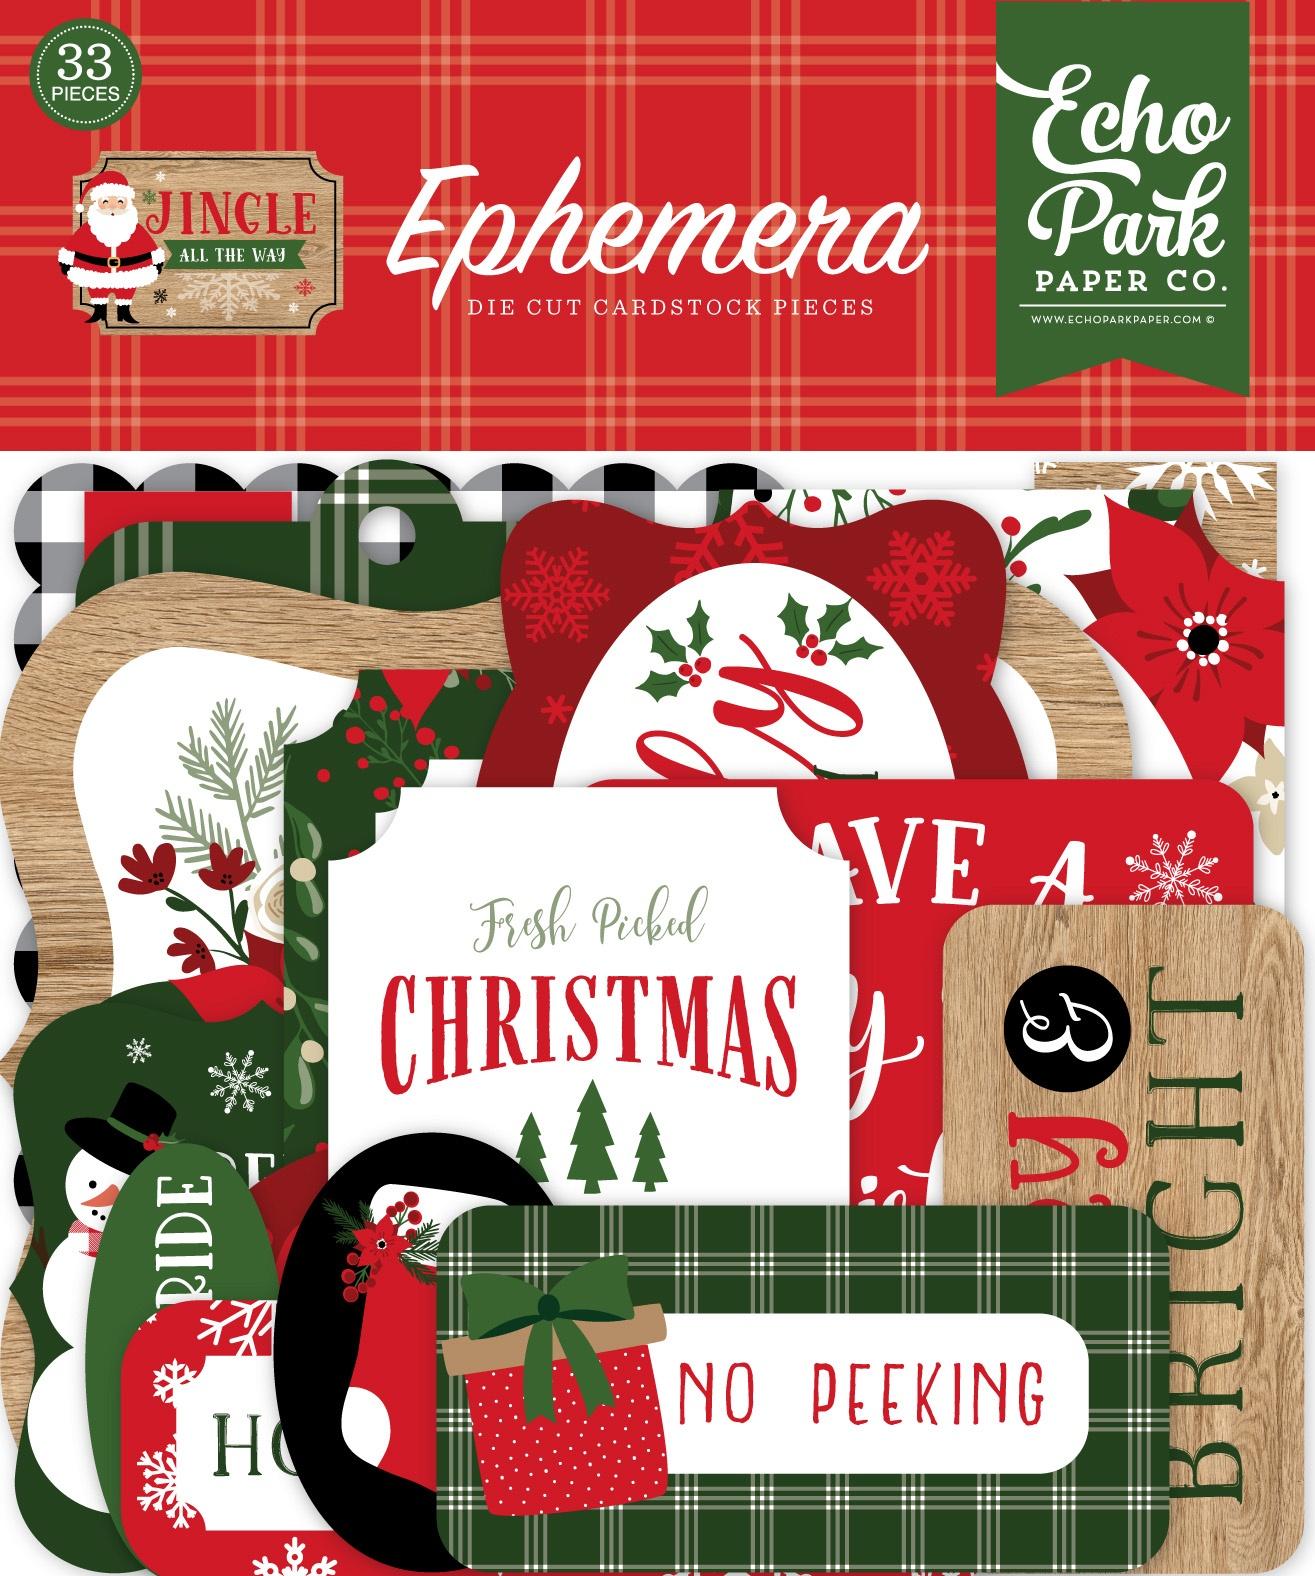 Echo Park - Jingle All The Way - Ephemera